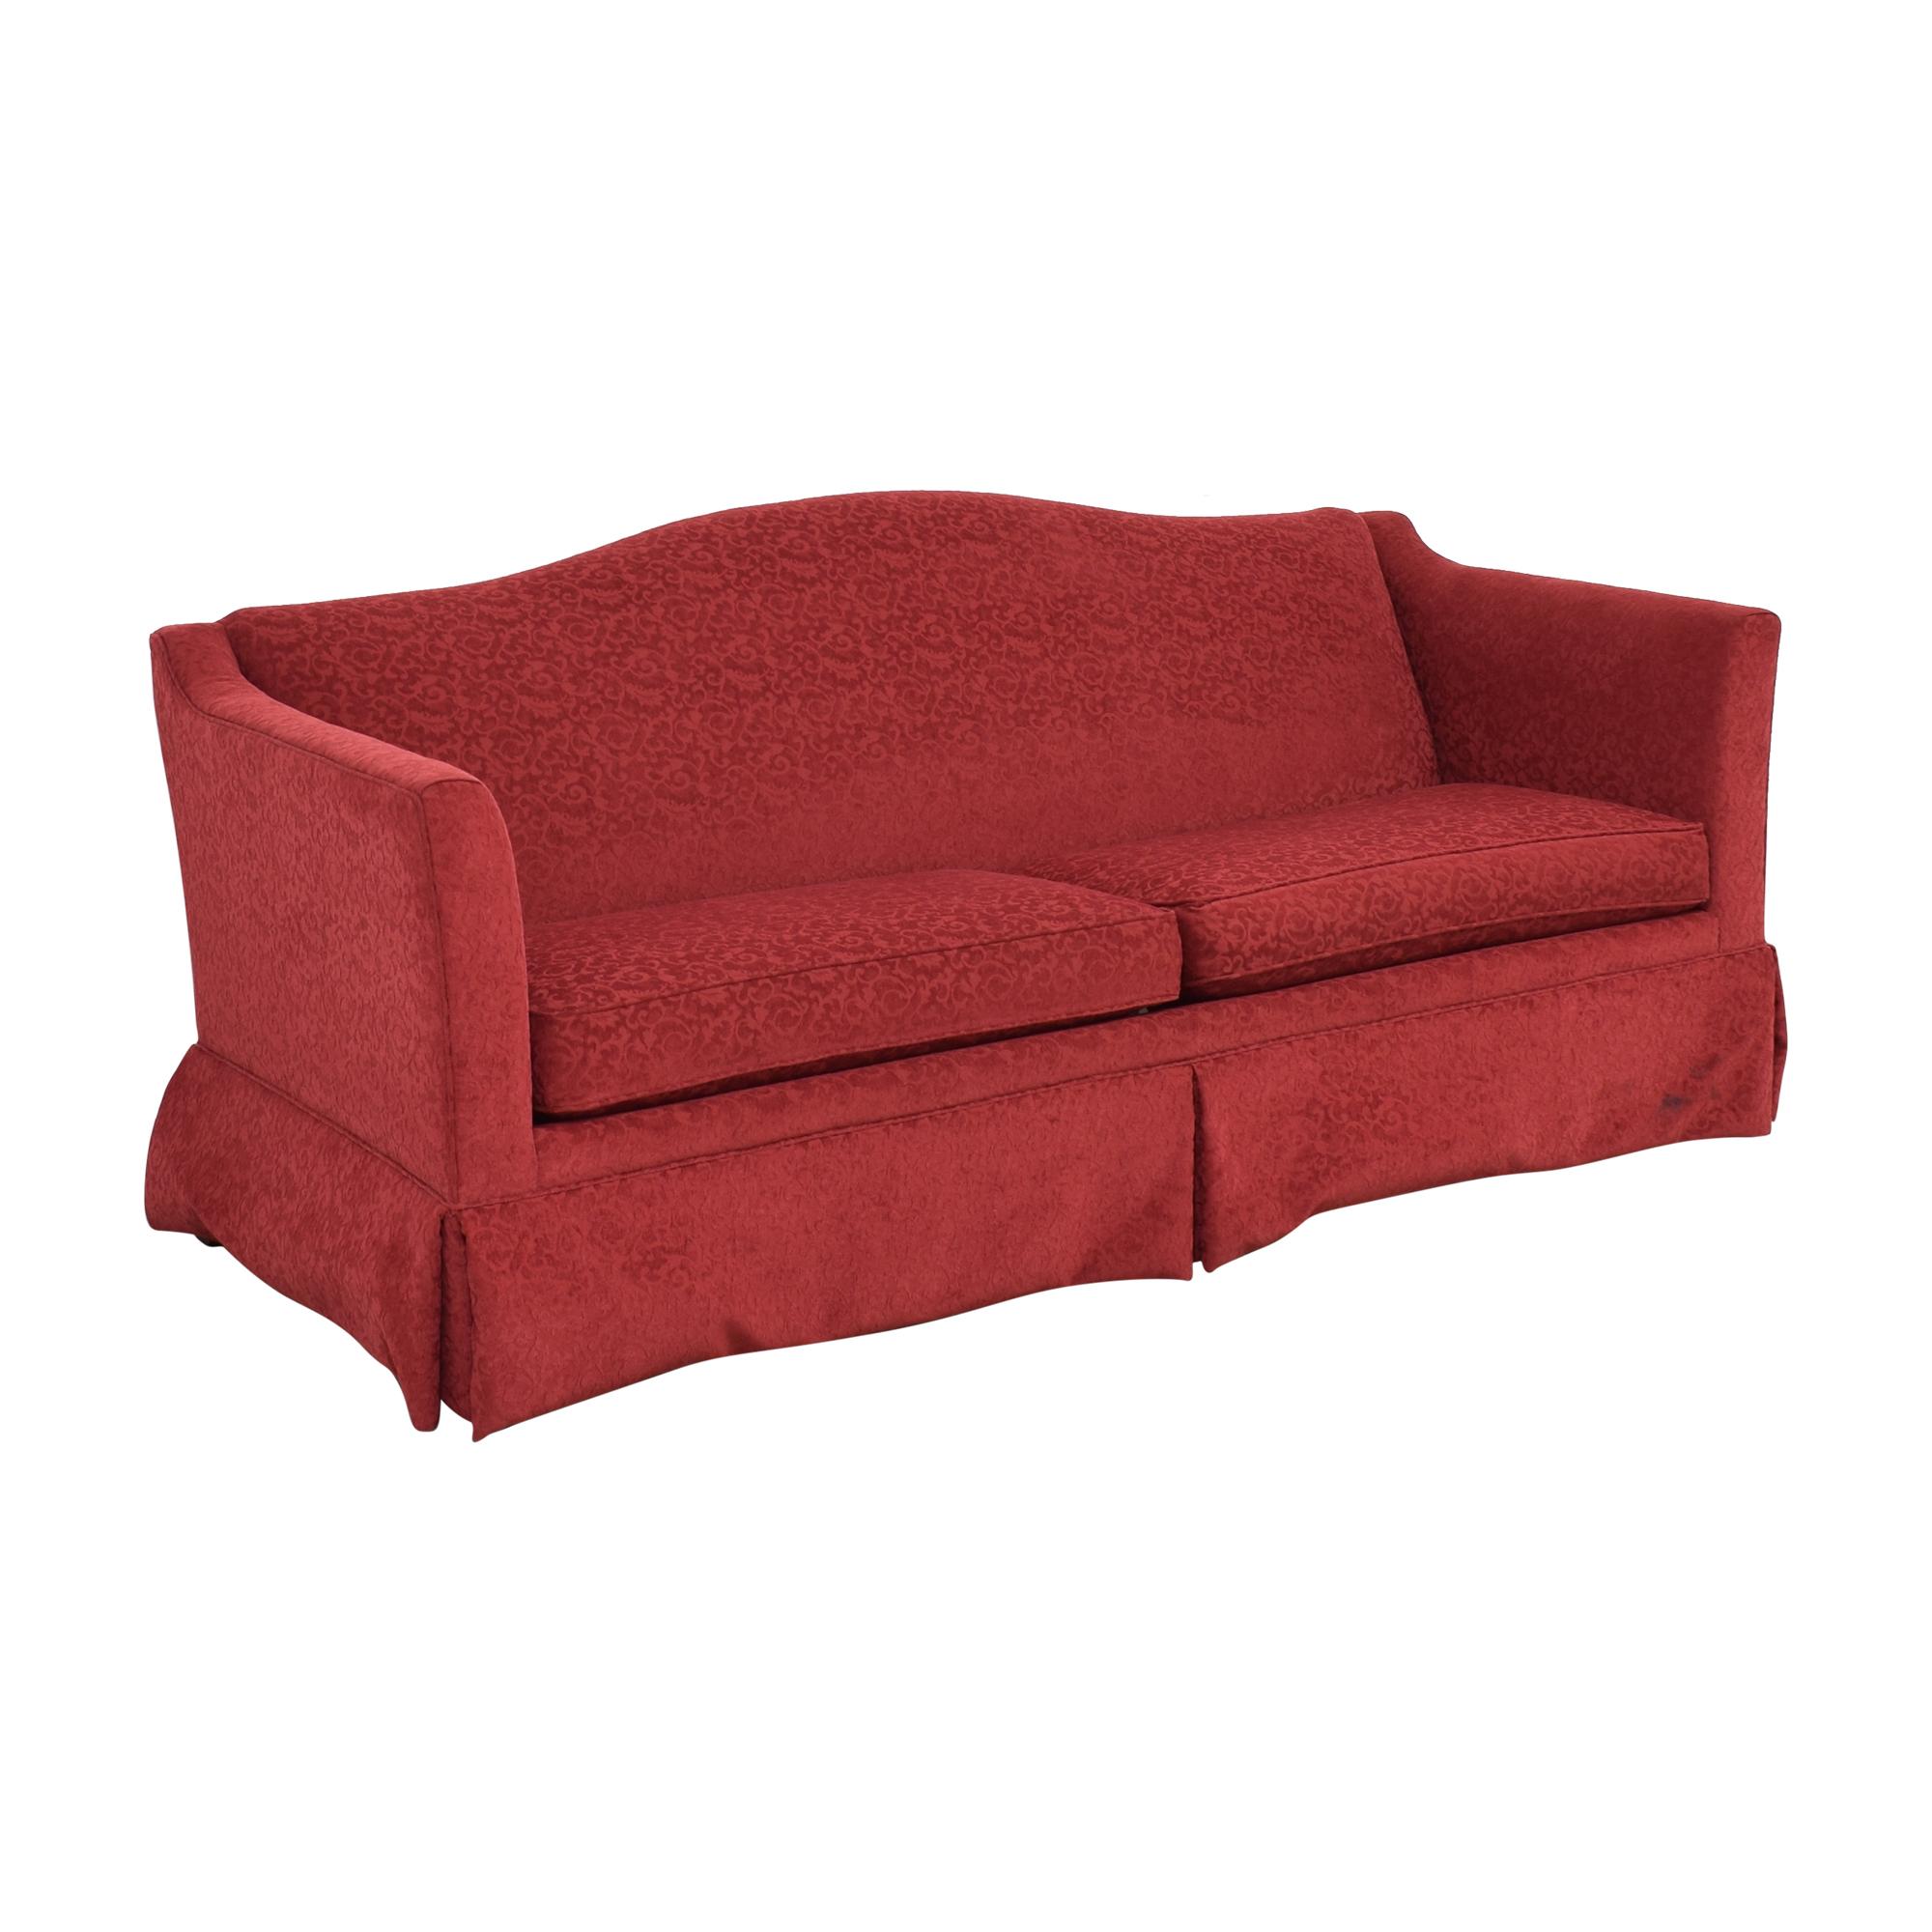 Ethan Allen Ethan Allen Two Cushion Skirted Sofa nj